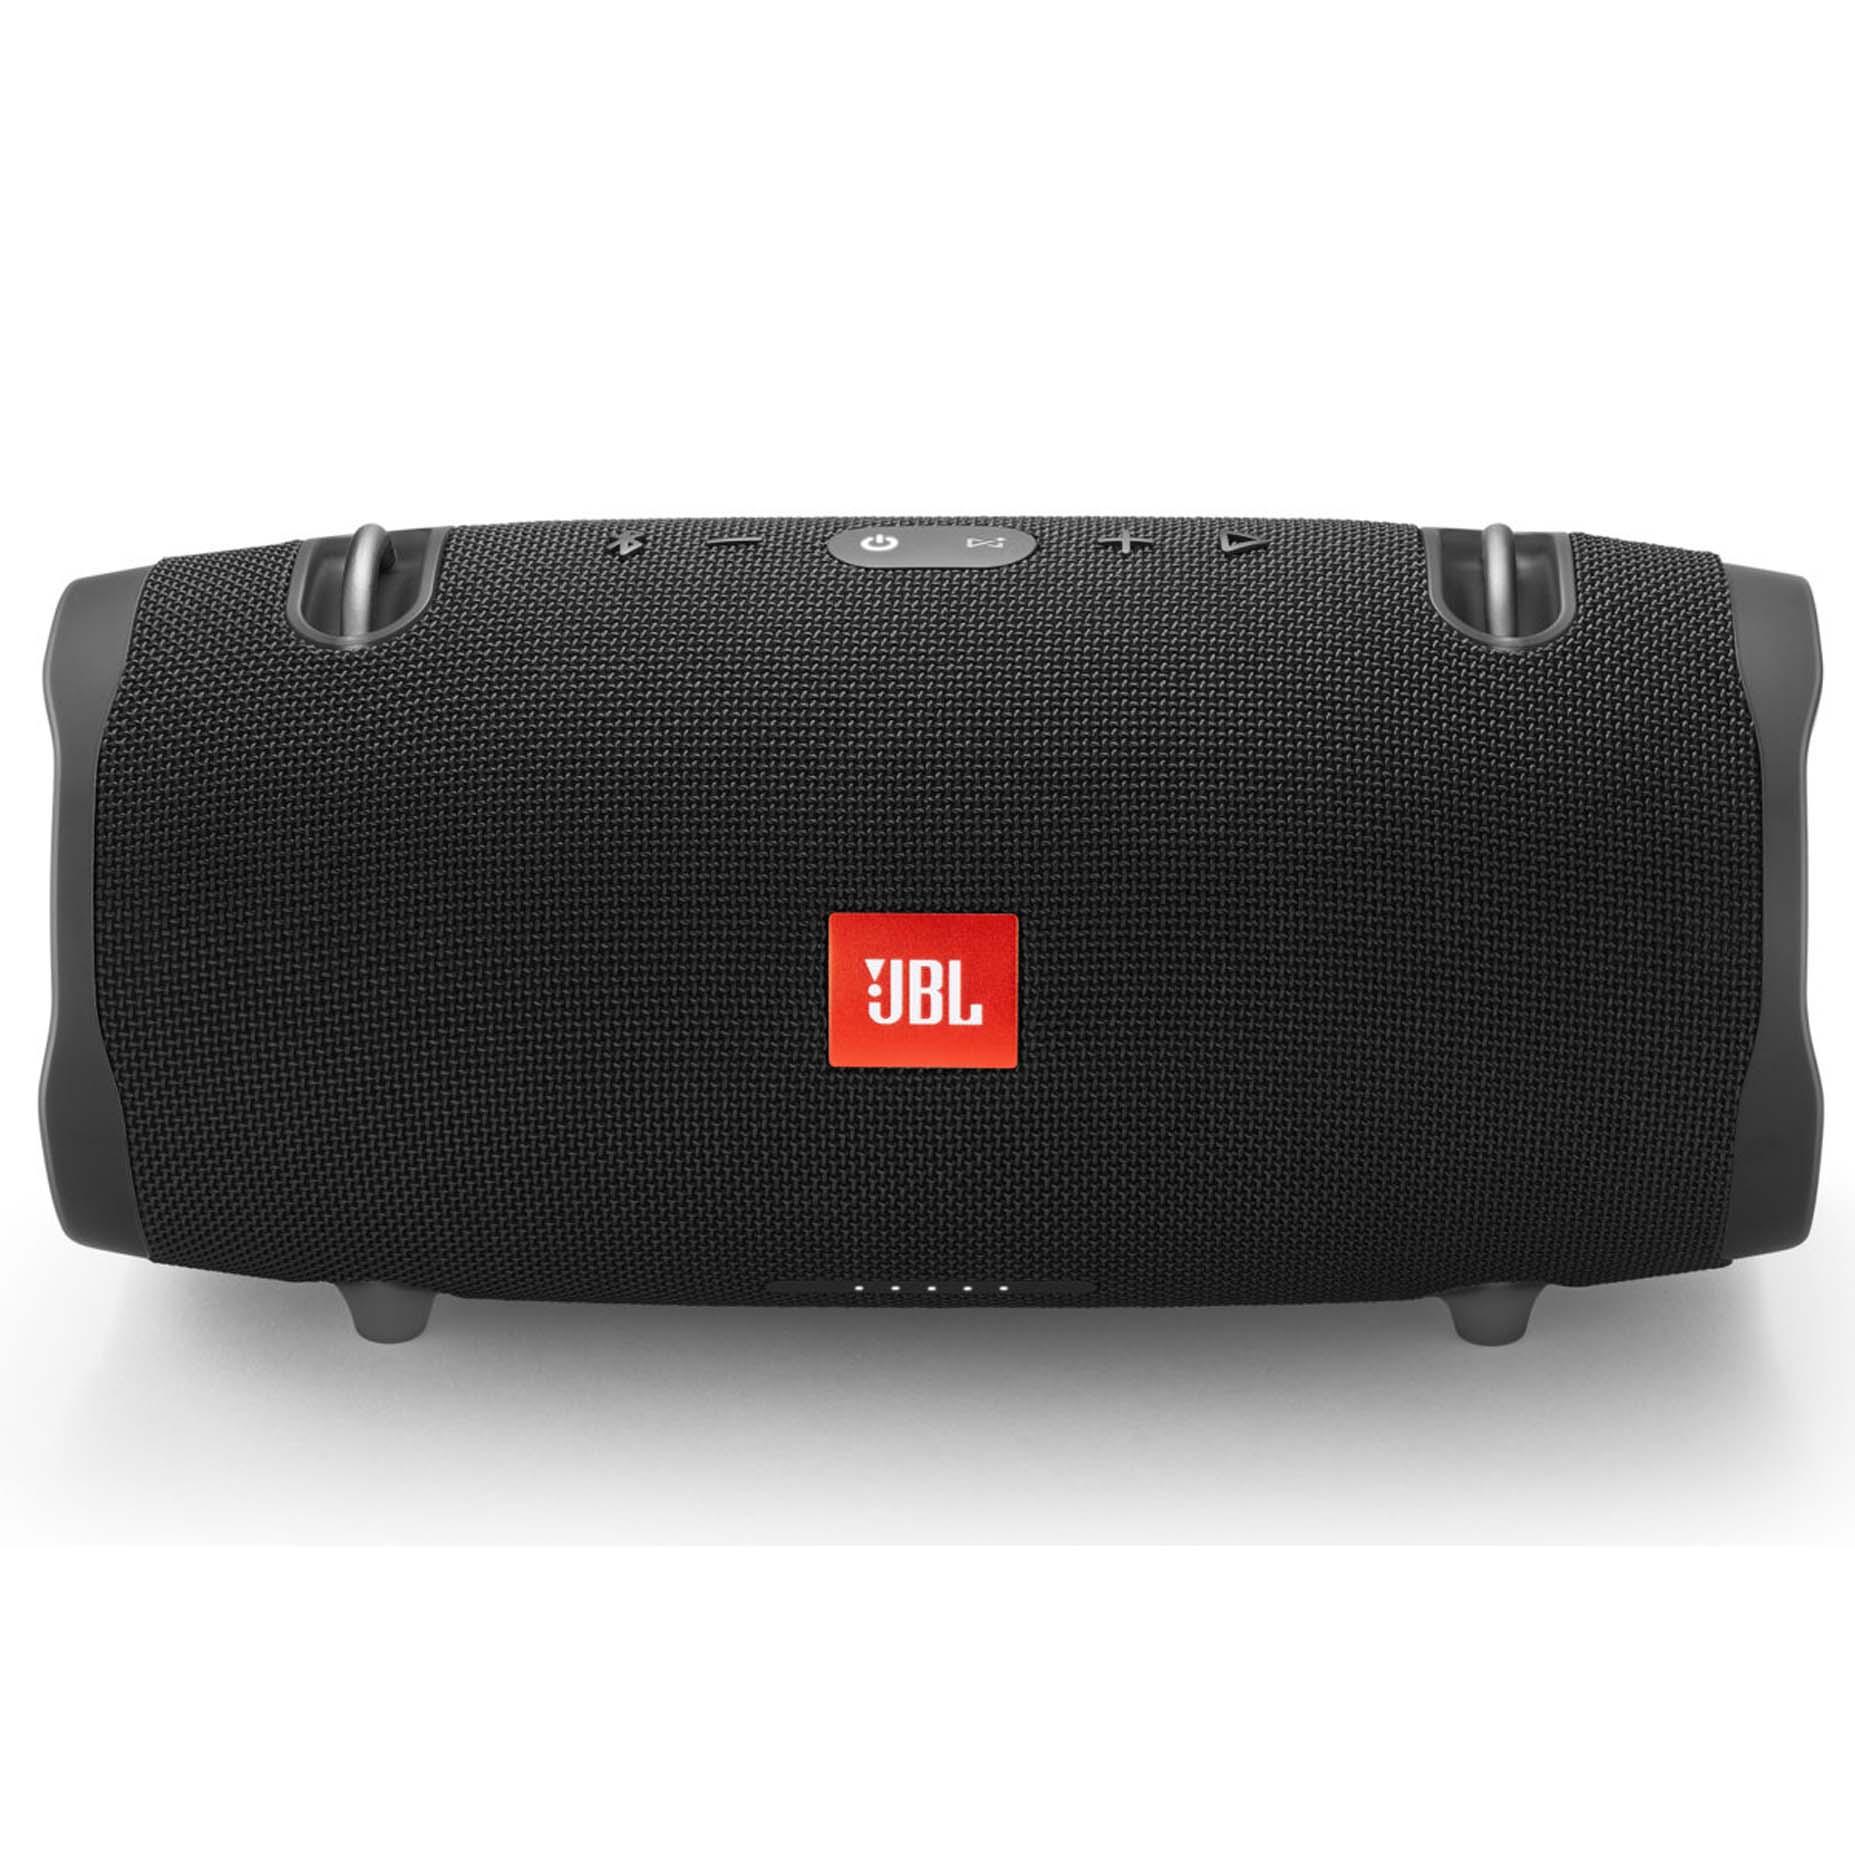 Harga JBL Xtreme 2 Portable Bluetooth Speaker